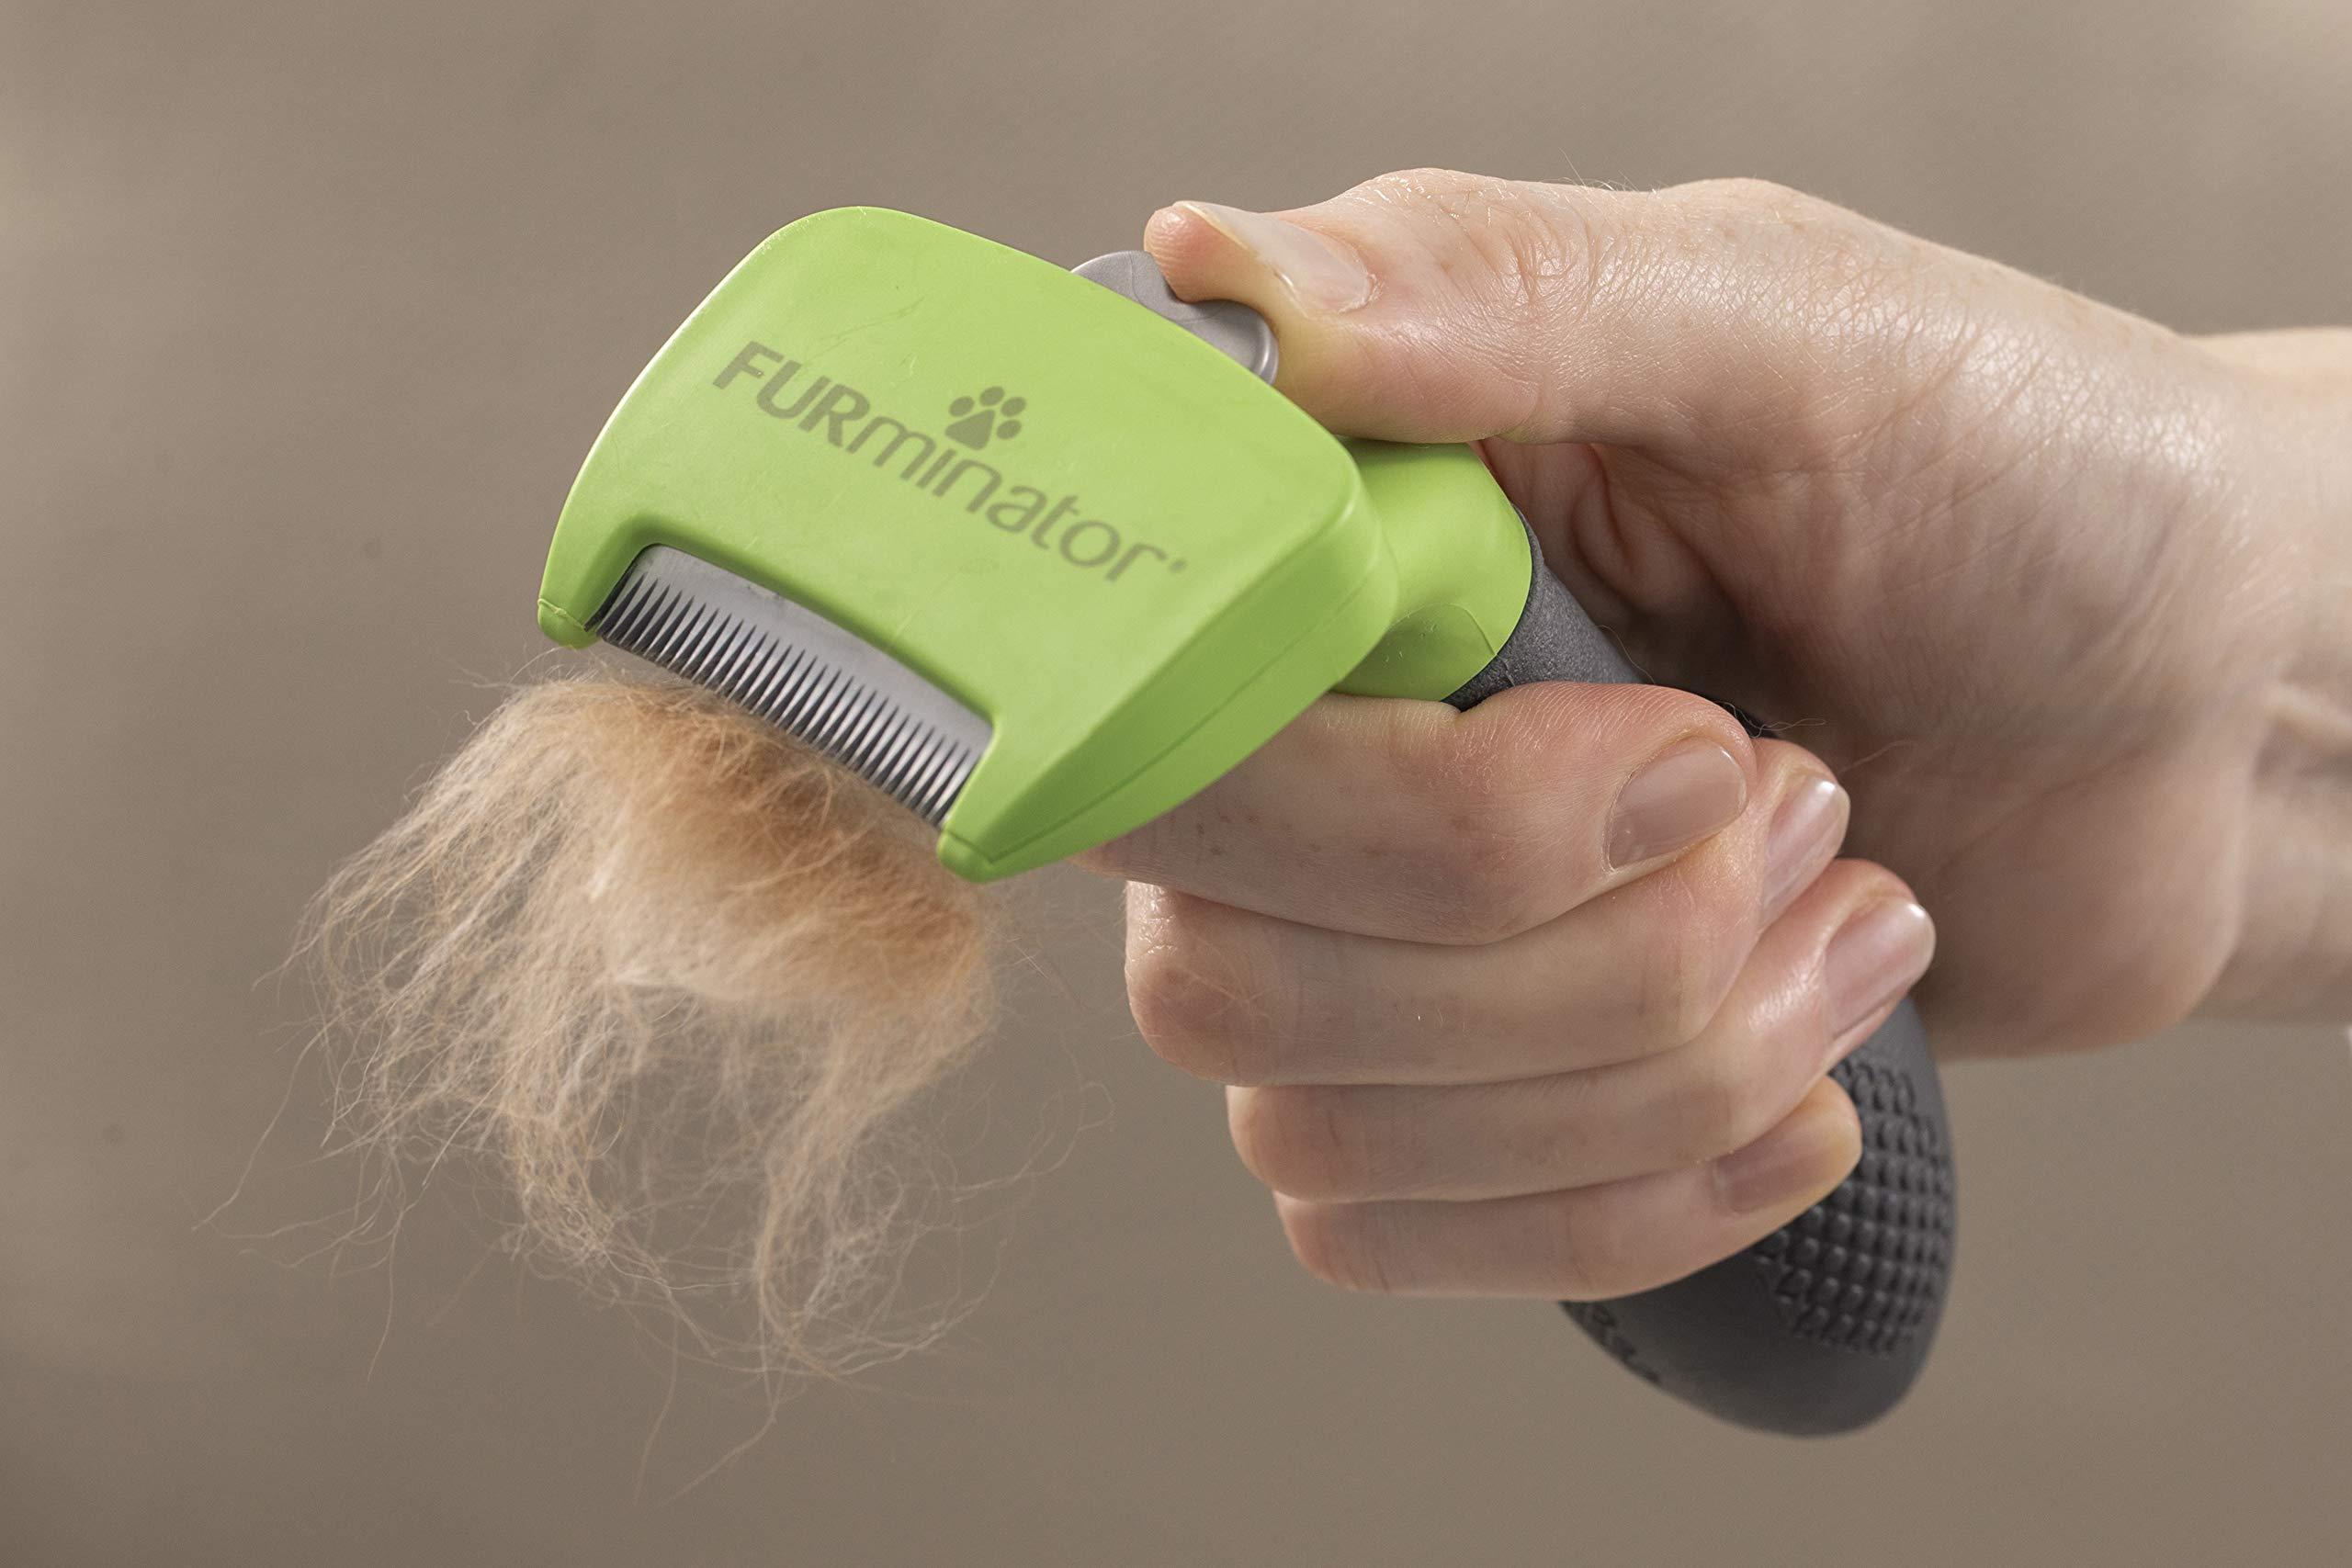 Furminator 141037 Dog Deshedding S Long Hair S by Furminator